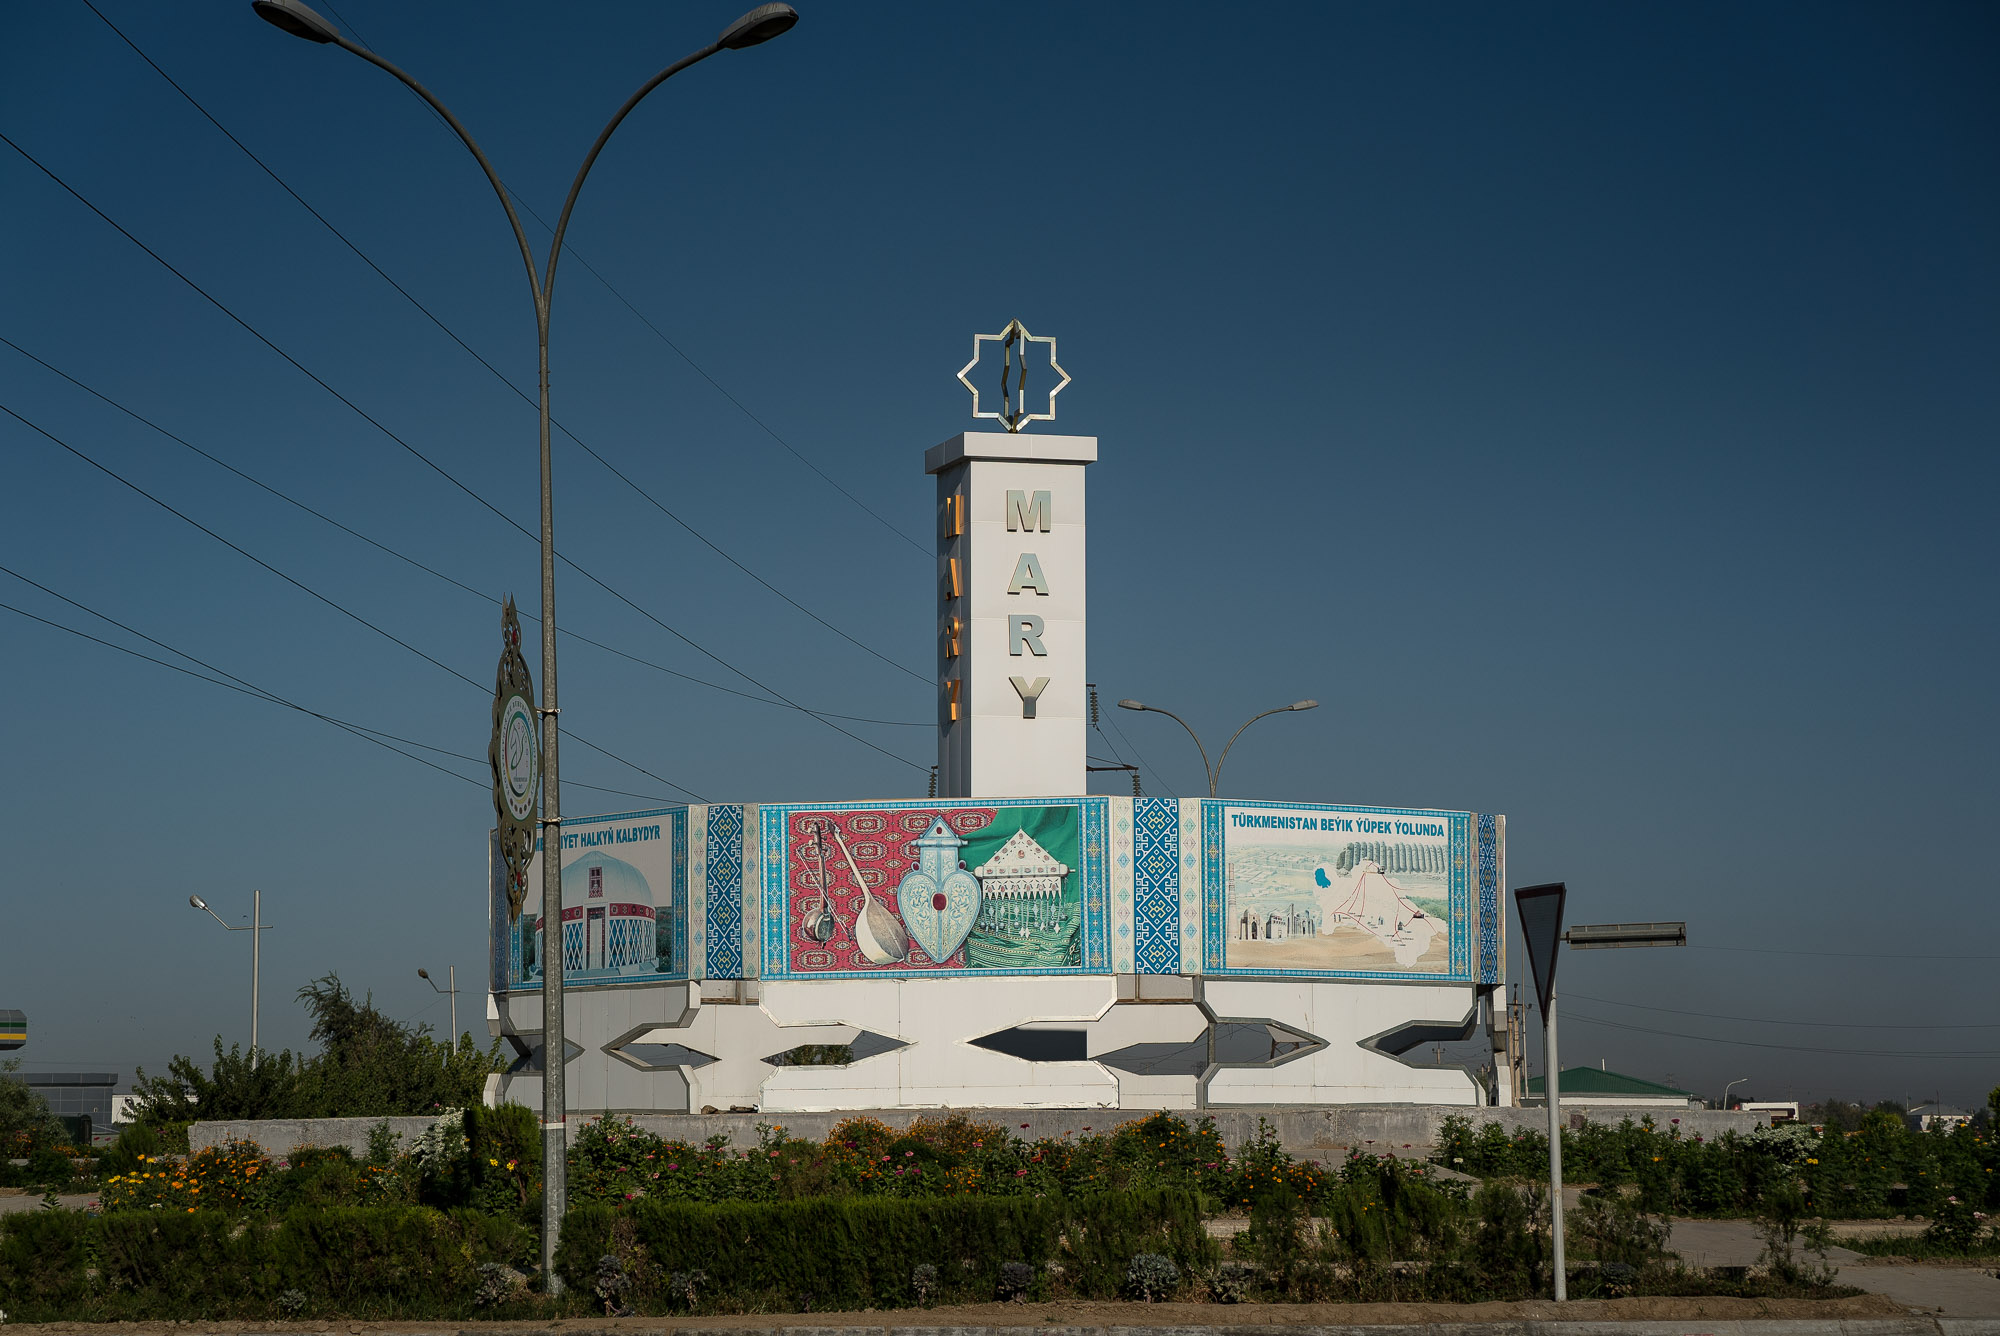 Mary city monument